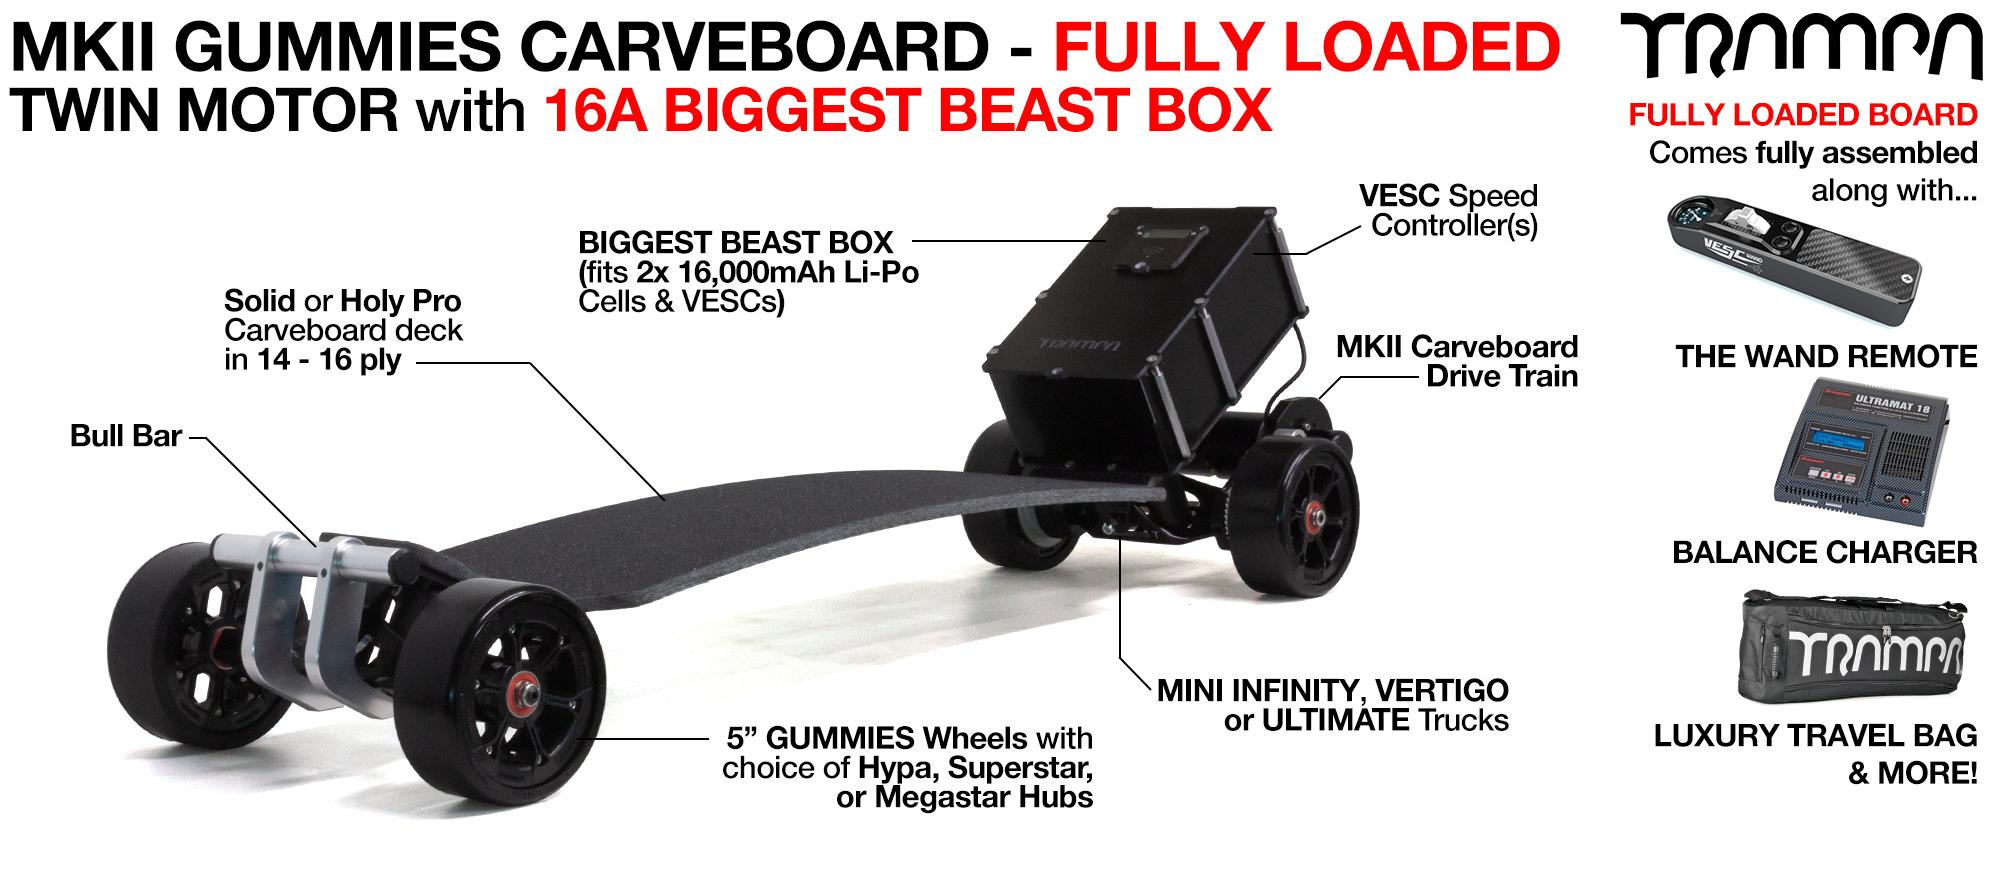 PRO GUMMIE ELECTRIC Carveboard 2 in 1 TWIN MOTOR with massive 16A BEAST Box Mini Spring Trucks & OFFSET MEGASTAR Wheels